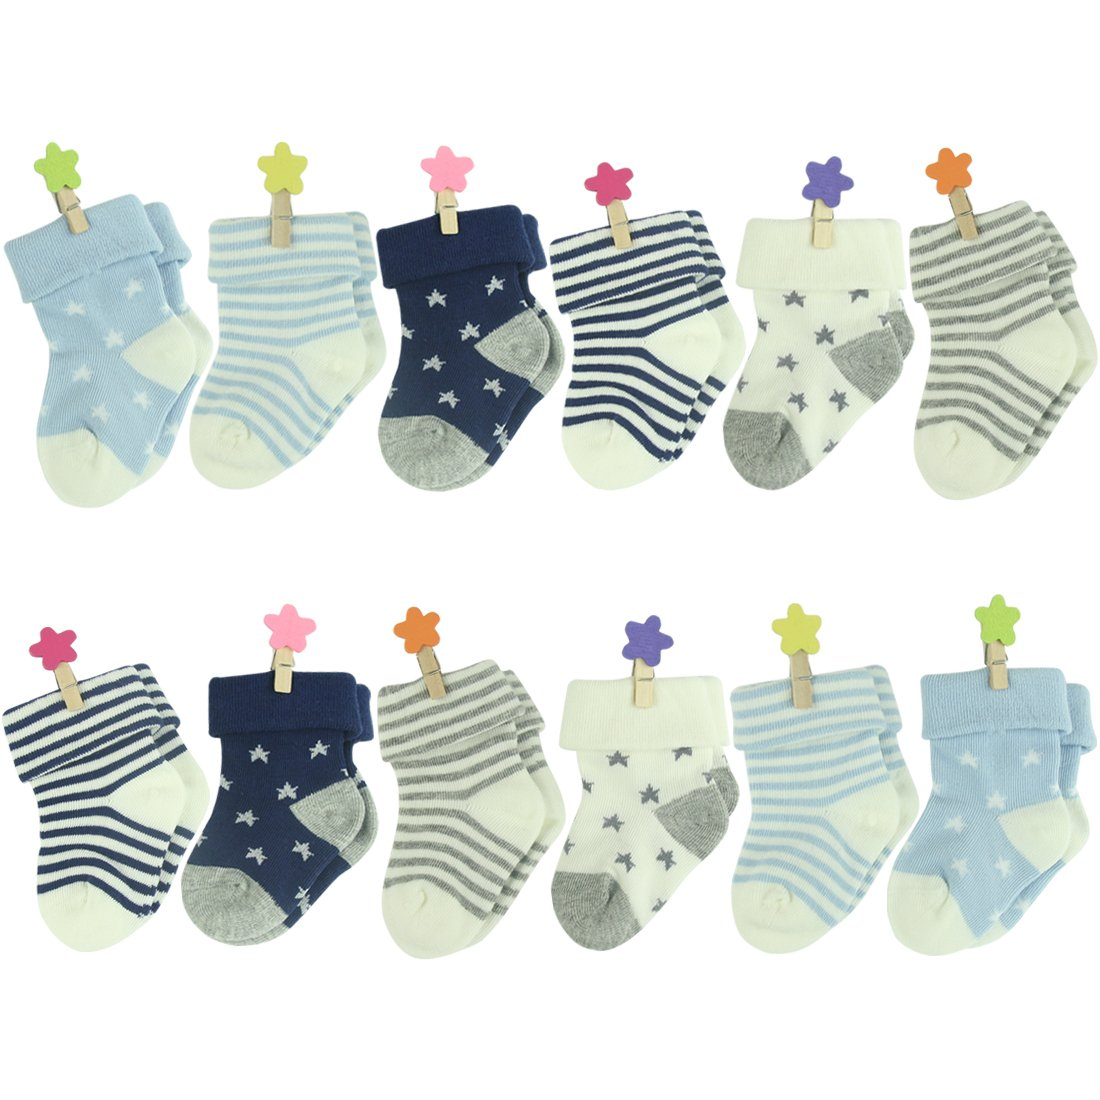 6-18 Months Socks, Unisex Baby Infant Newborn Summer Socks Star Stripe Cute Soft Cotton Crew Socks 12 Pairs,Colorfox by Colorfox